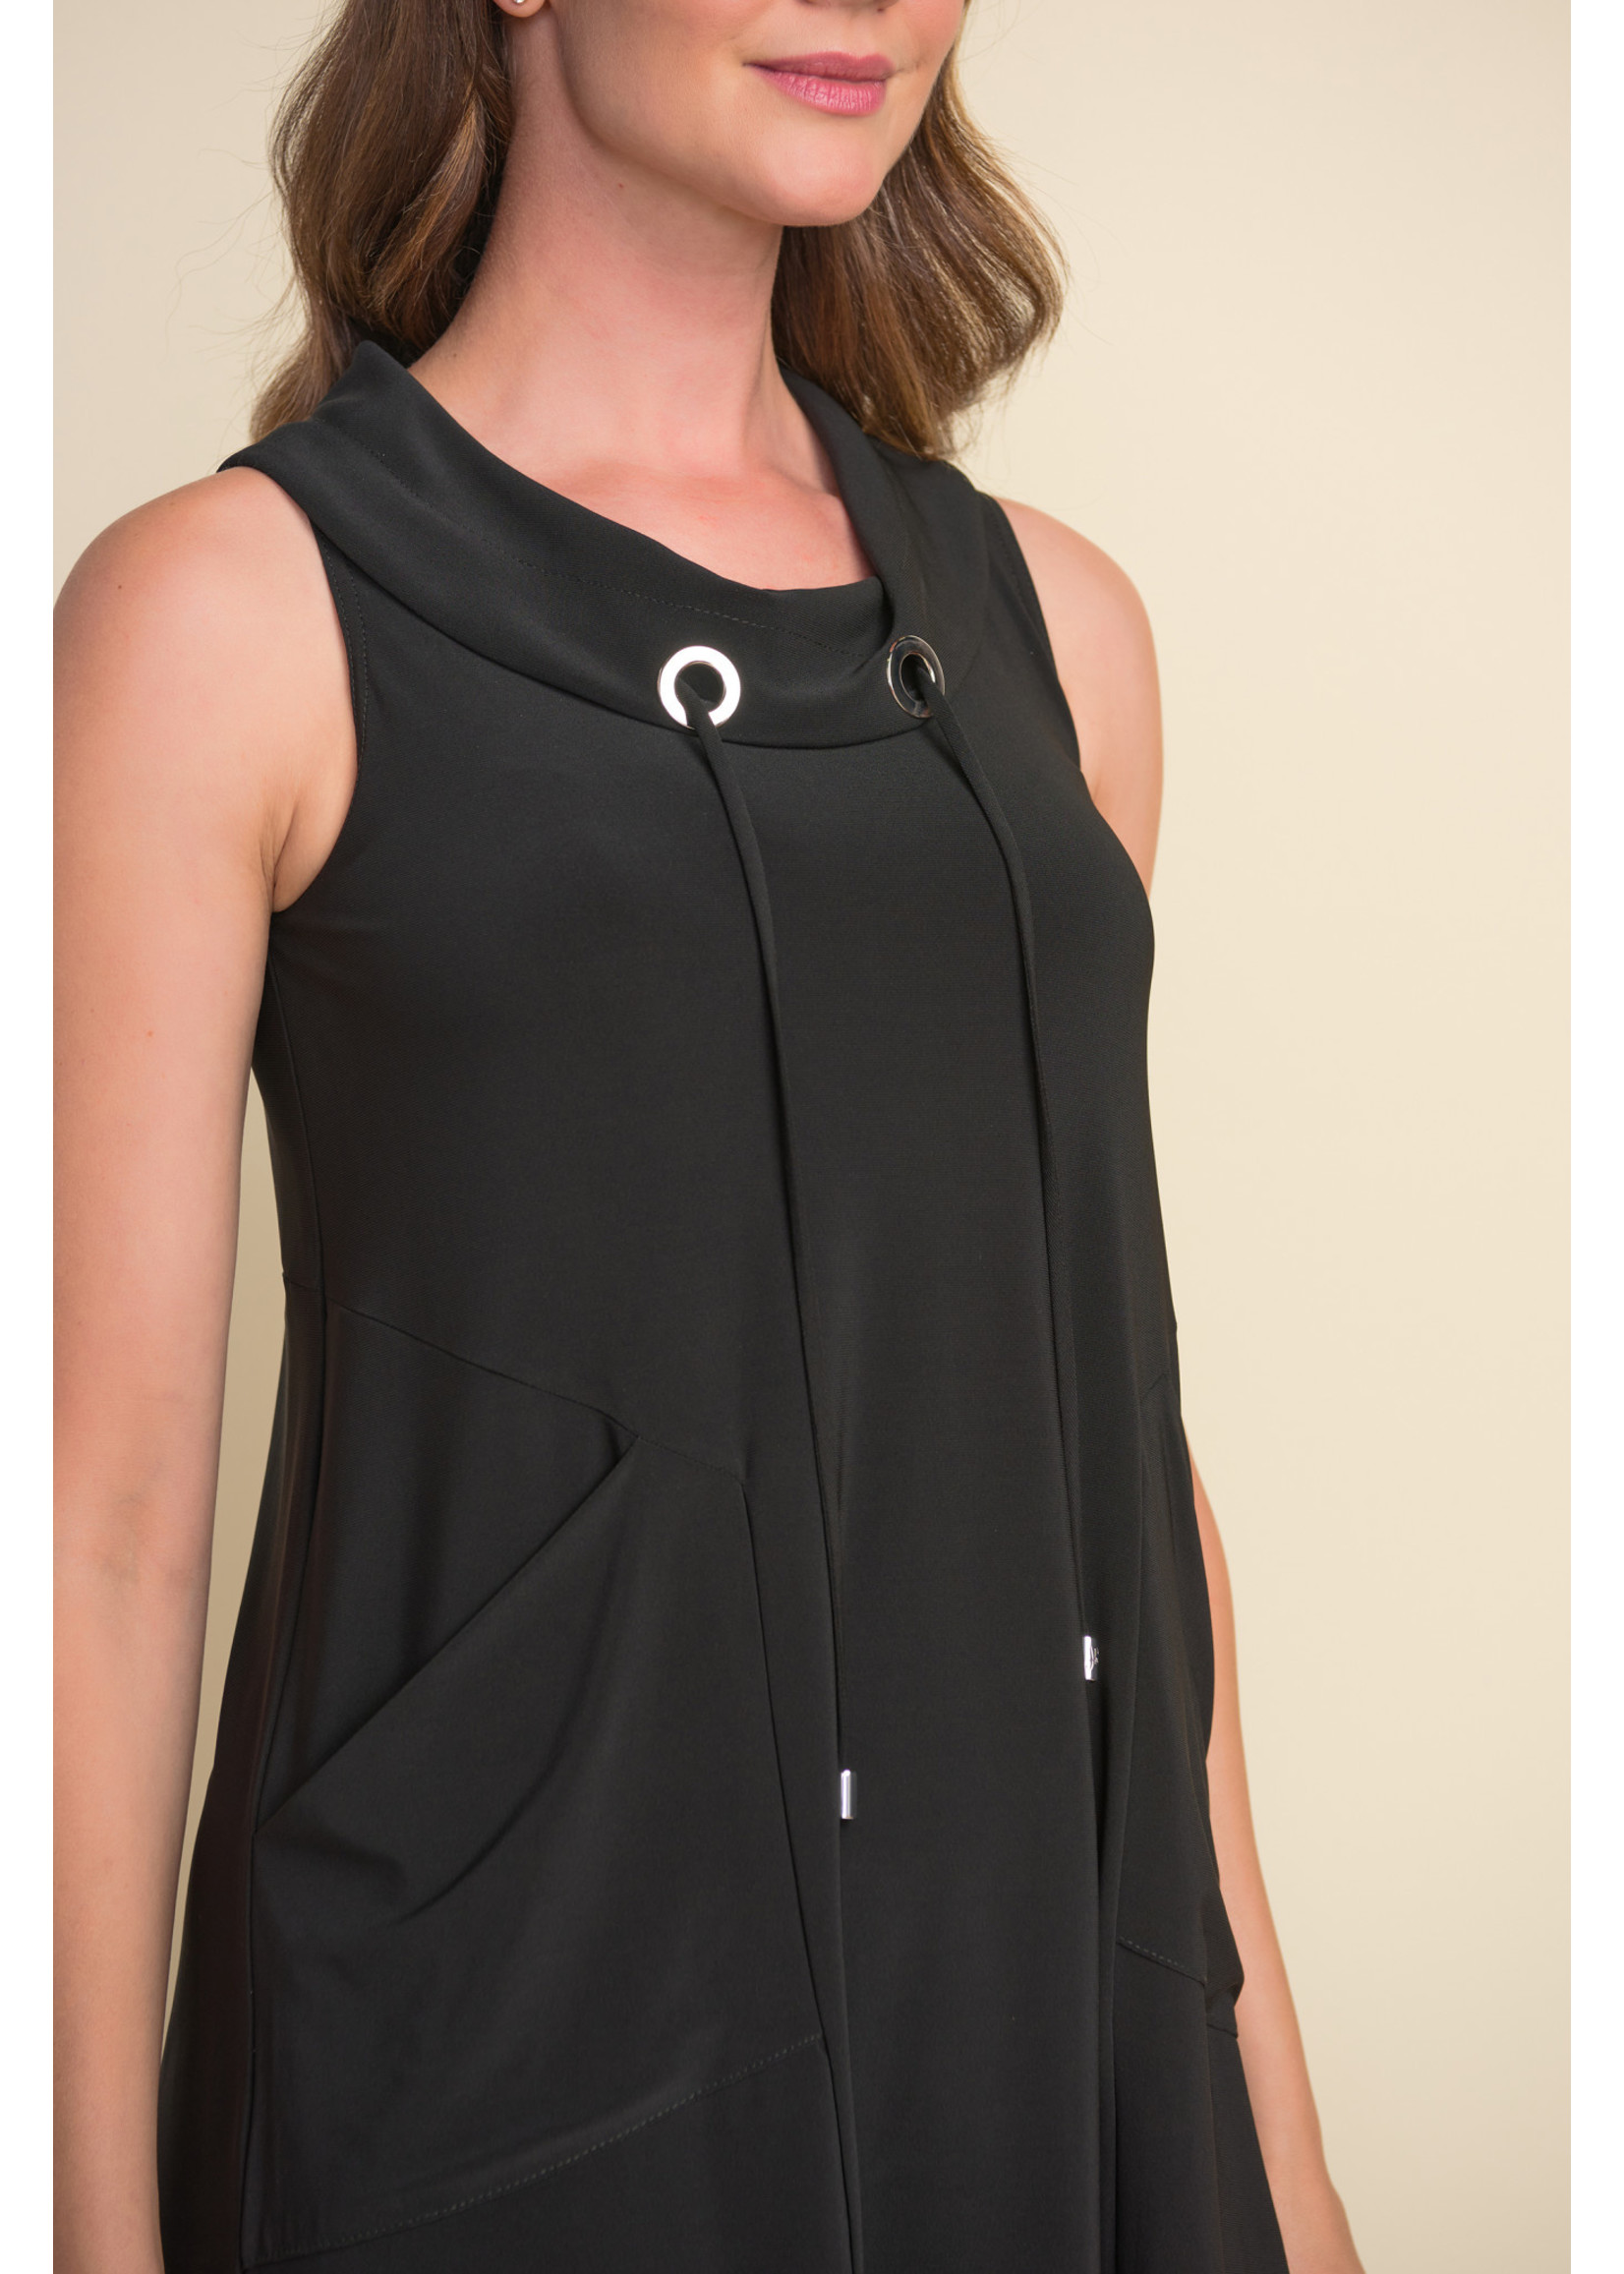 Joseph Ribkoff Black Tunic With Pockets